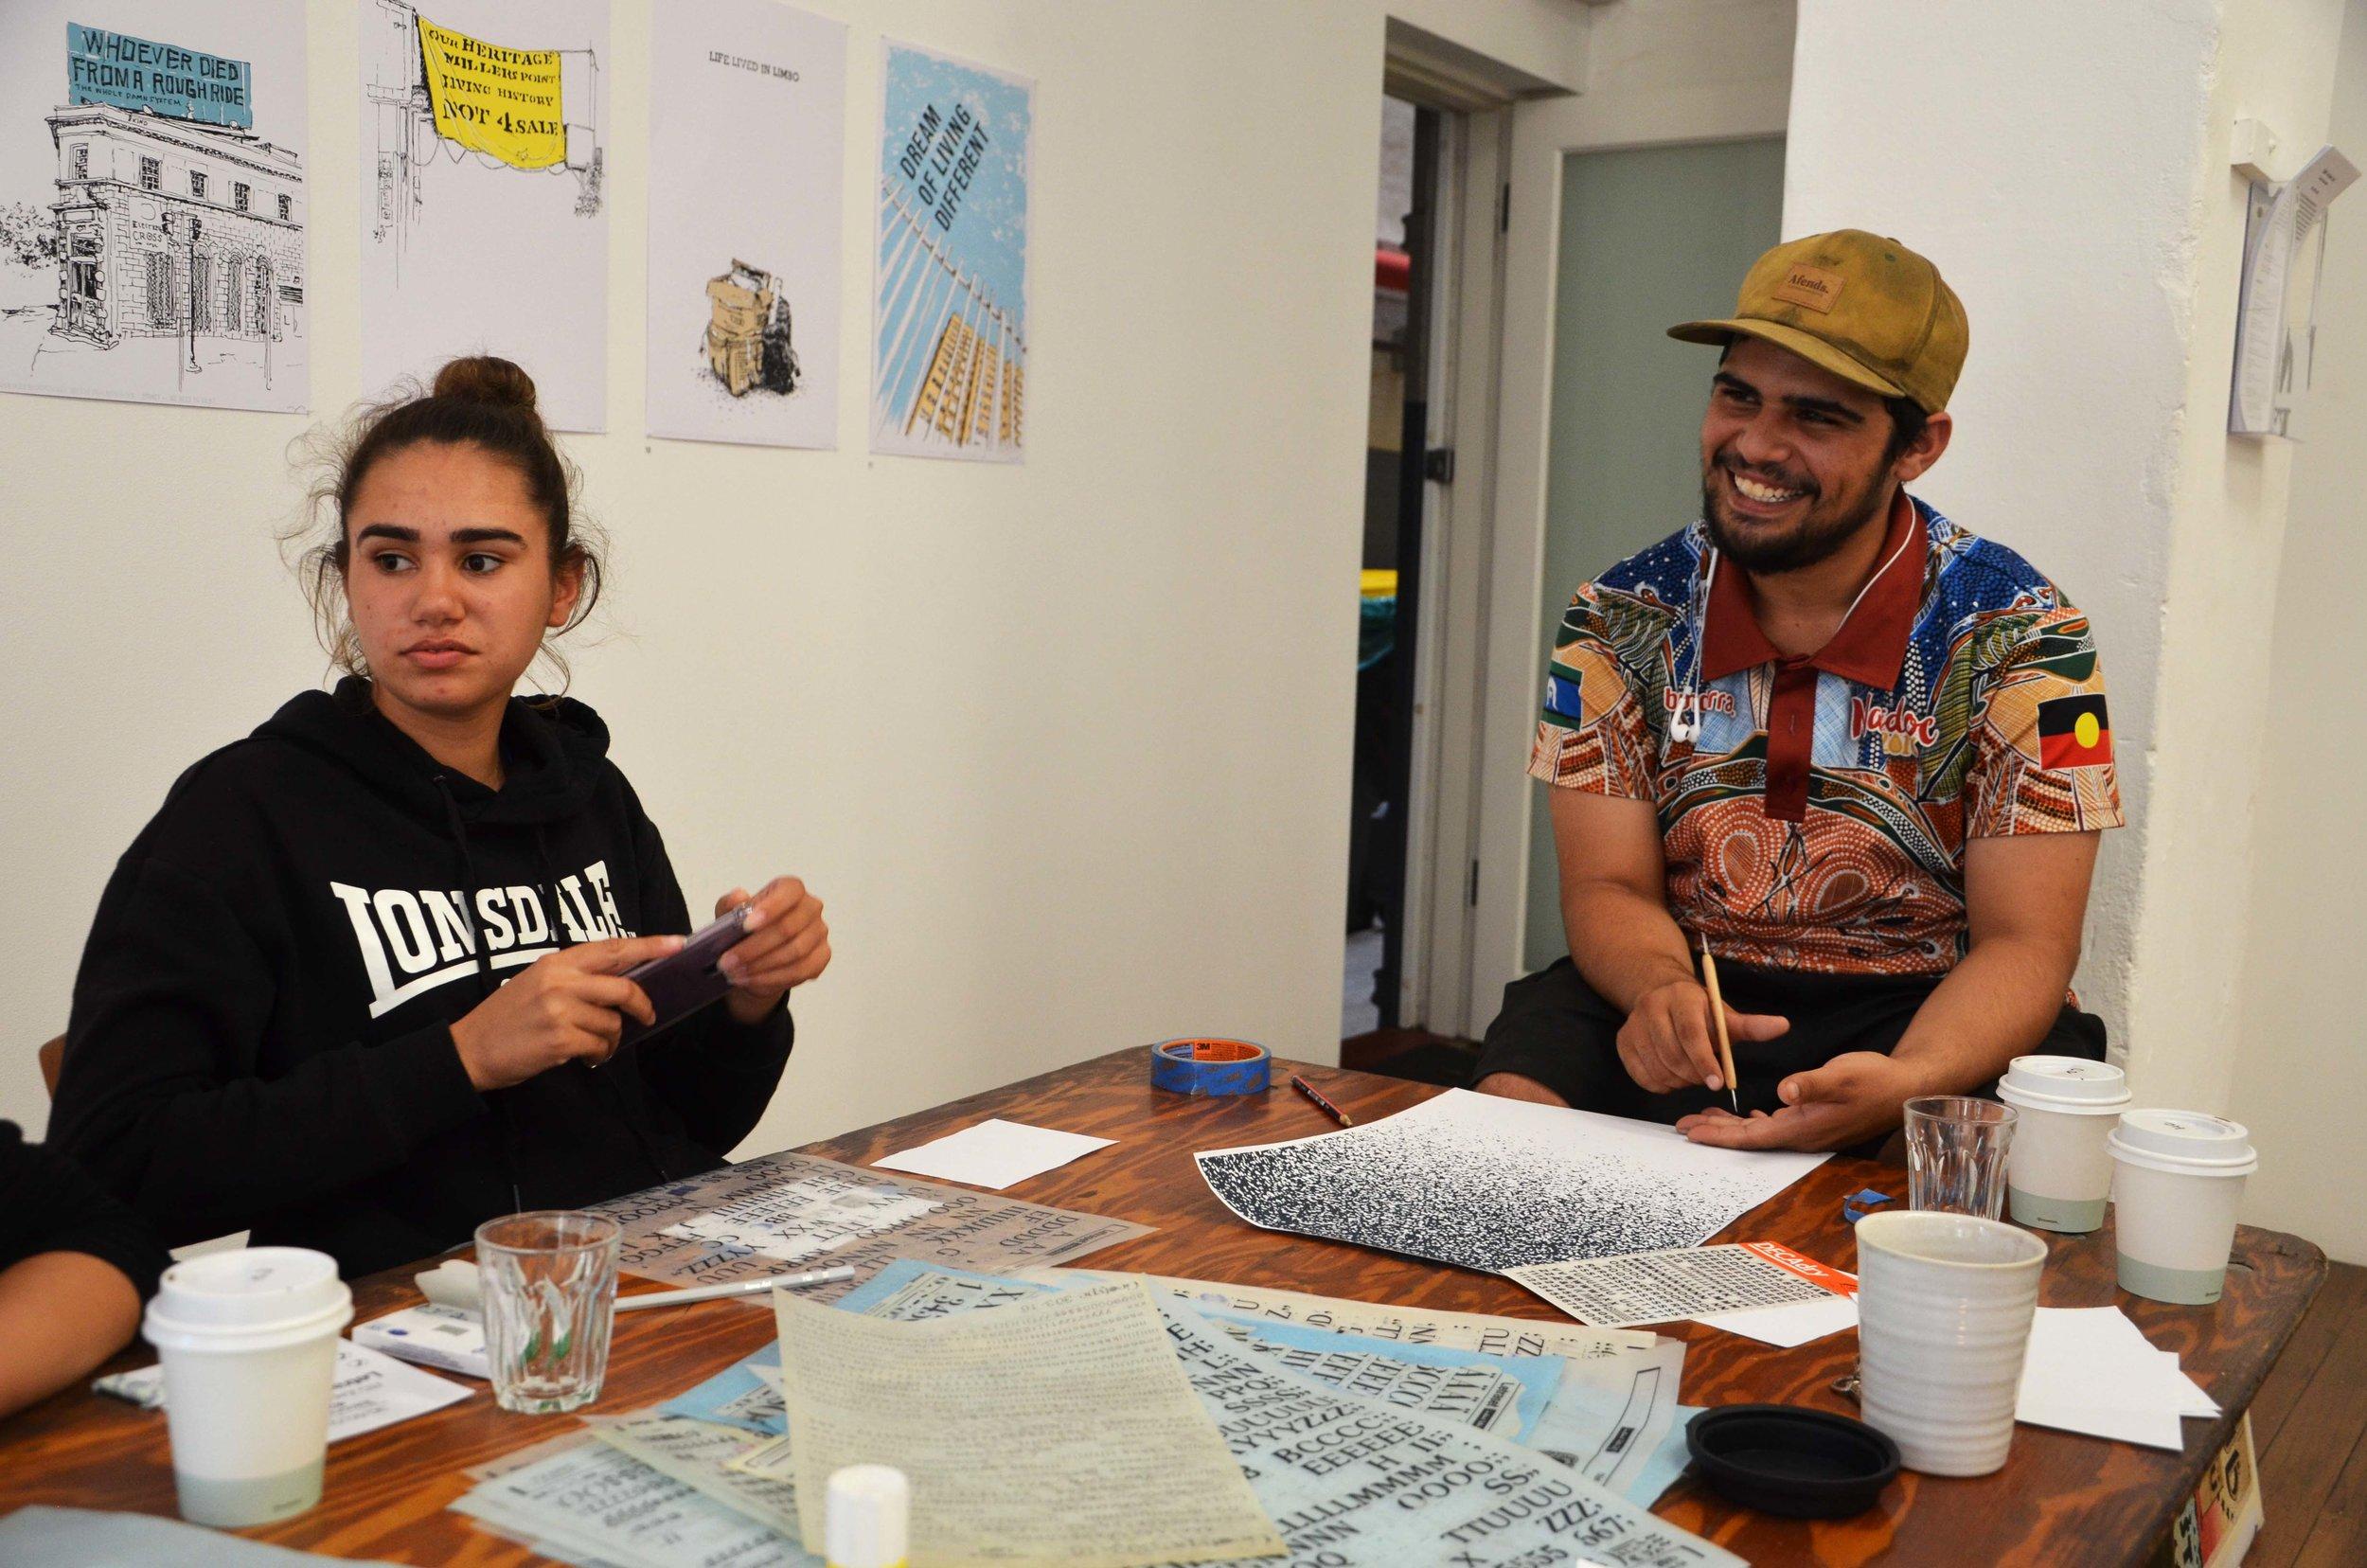 Photo courtesy of the Broken Hill Regional Art Gallery